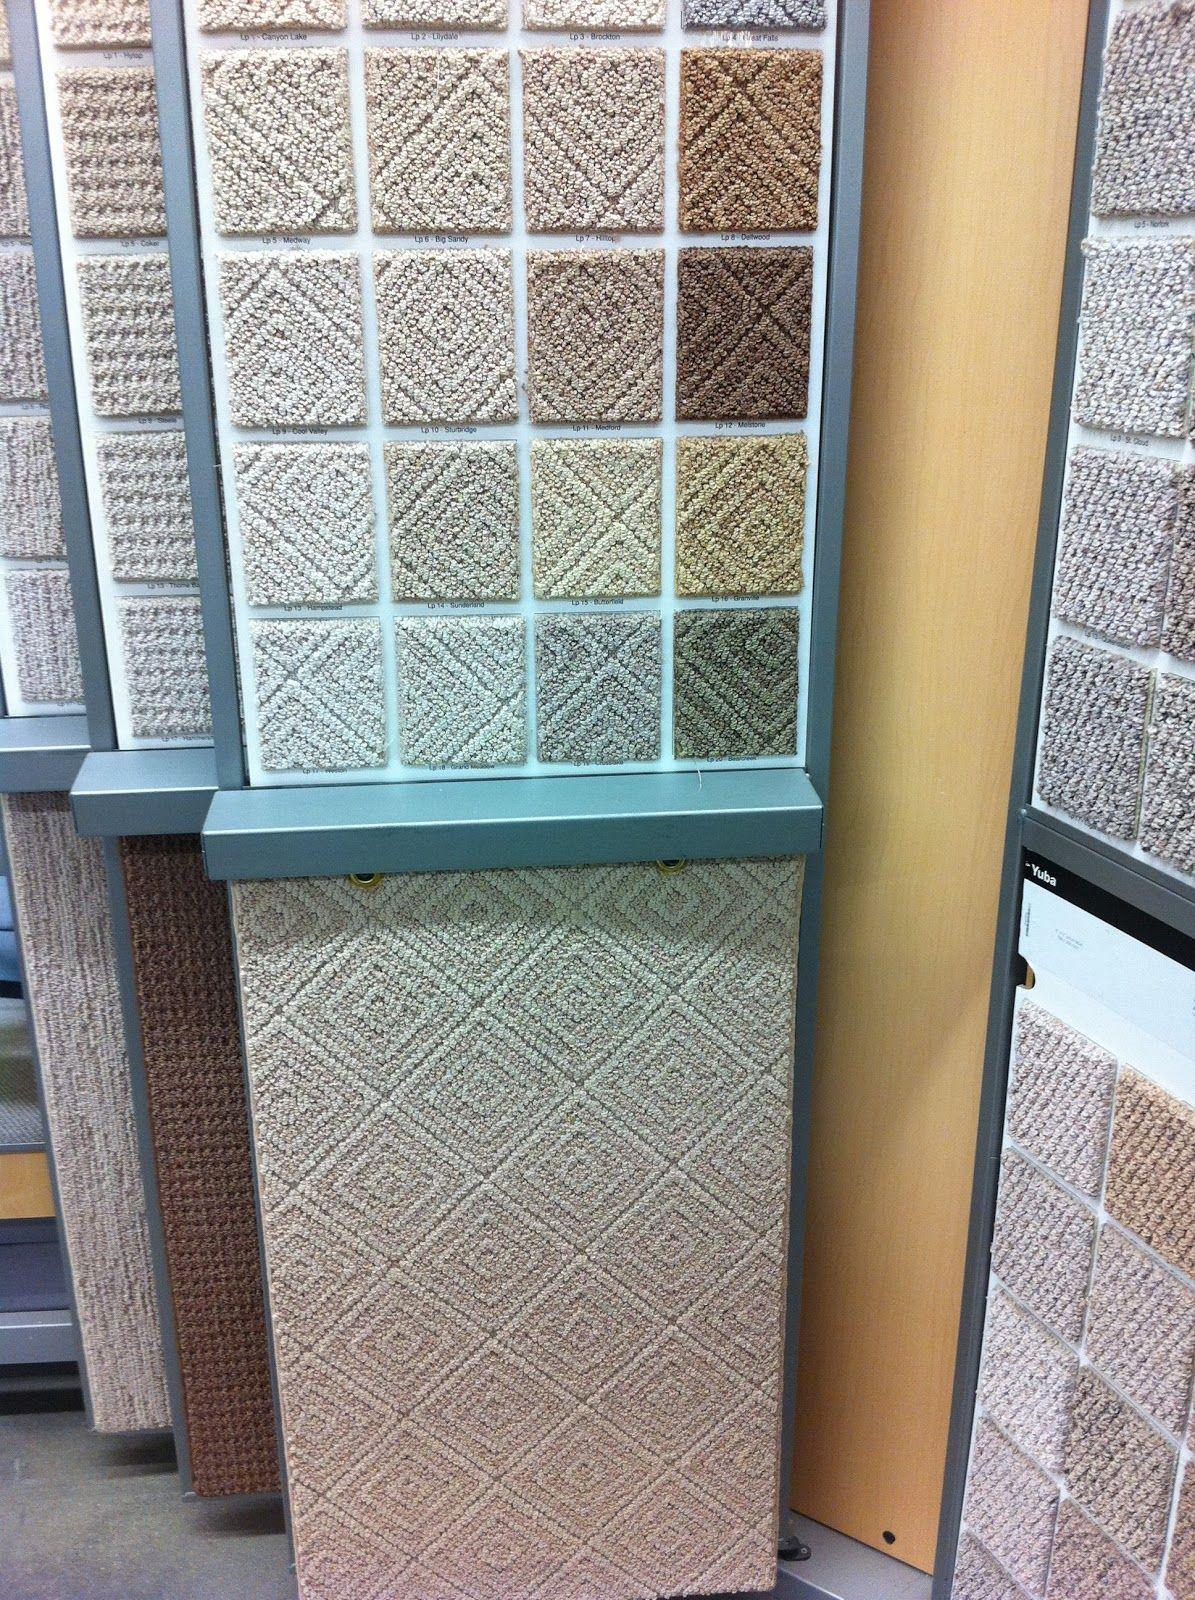 Best Home Depot Carpet Diamond Pattern Patterned Stair Carpet 640 x 480